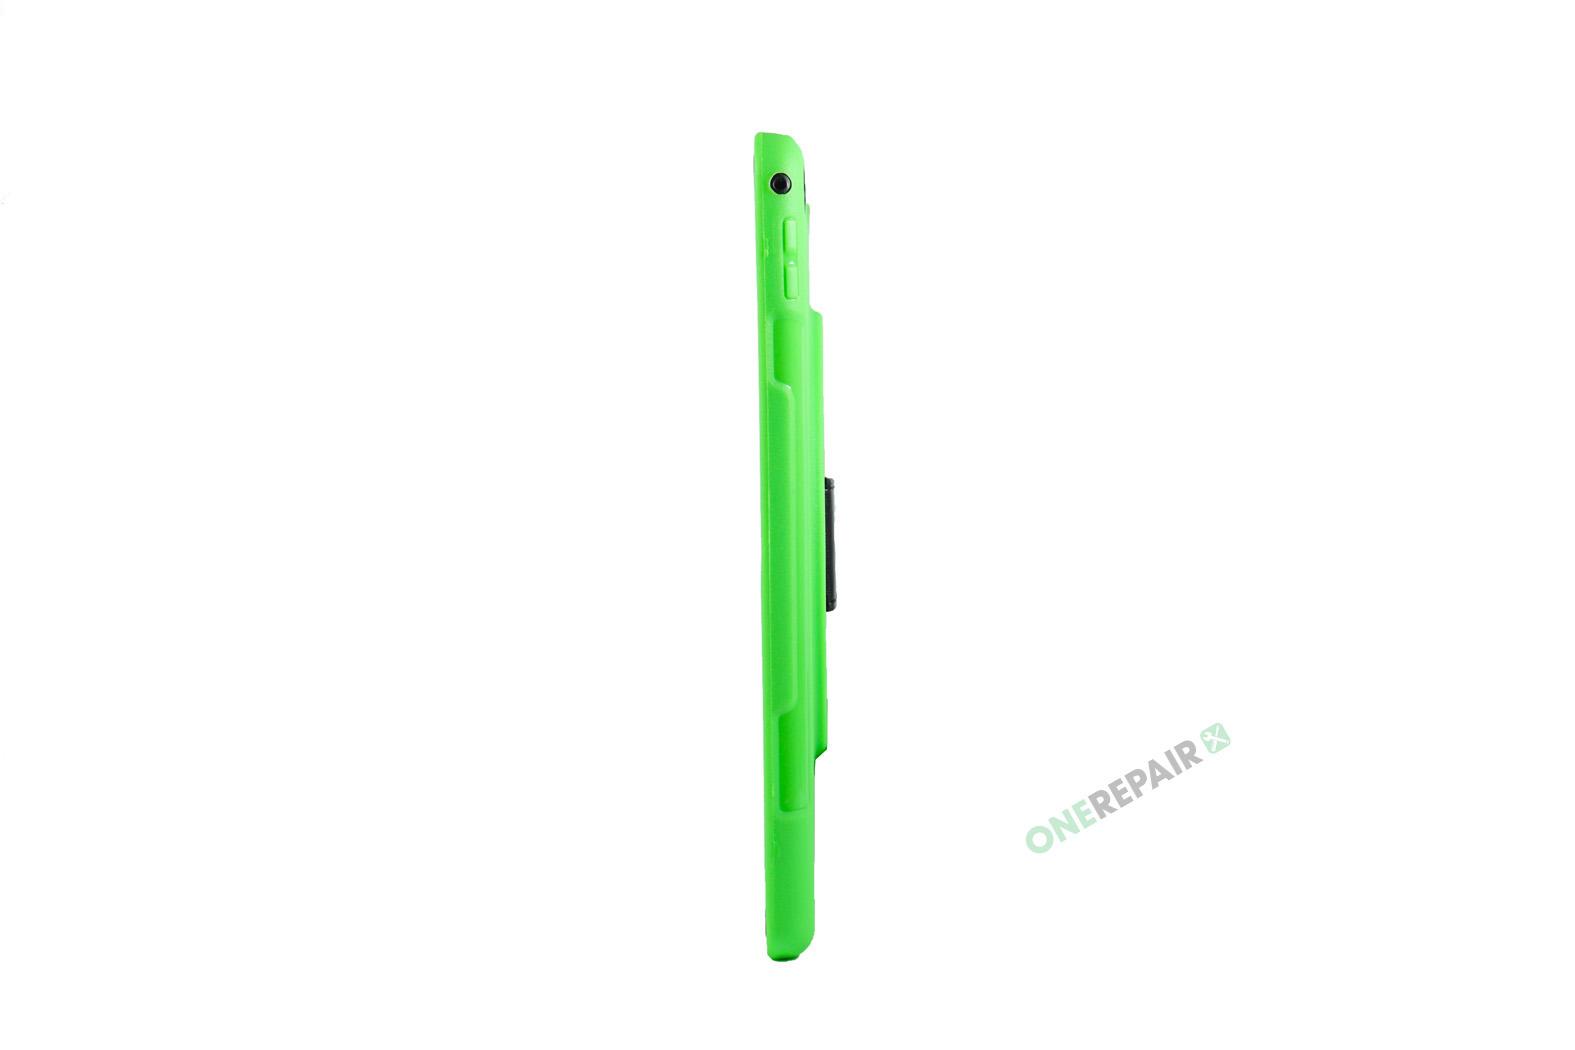 351069_iPad_Air2_2_A1566_A1567_3-in-1_Thin_Boernecover_Børne_Hardcase_Cover_Groen_OneRepair_00003